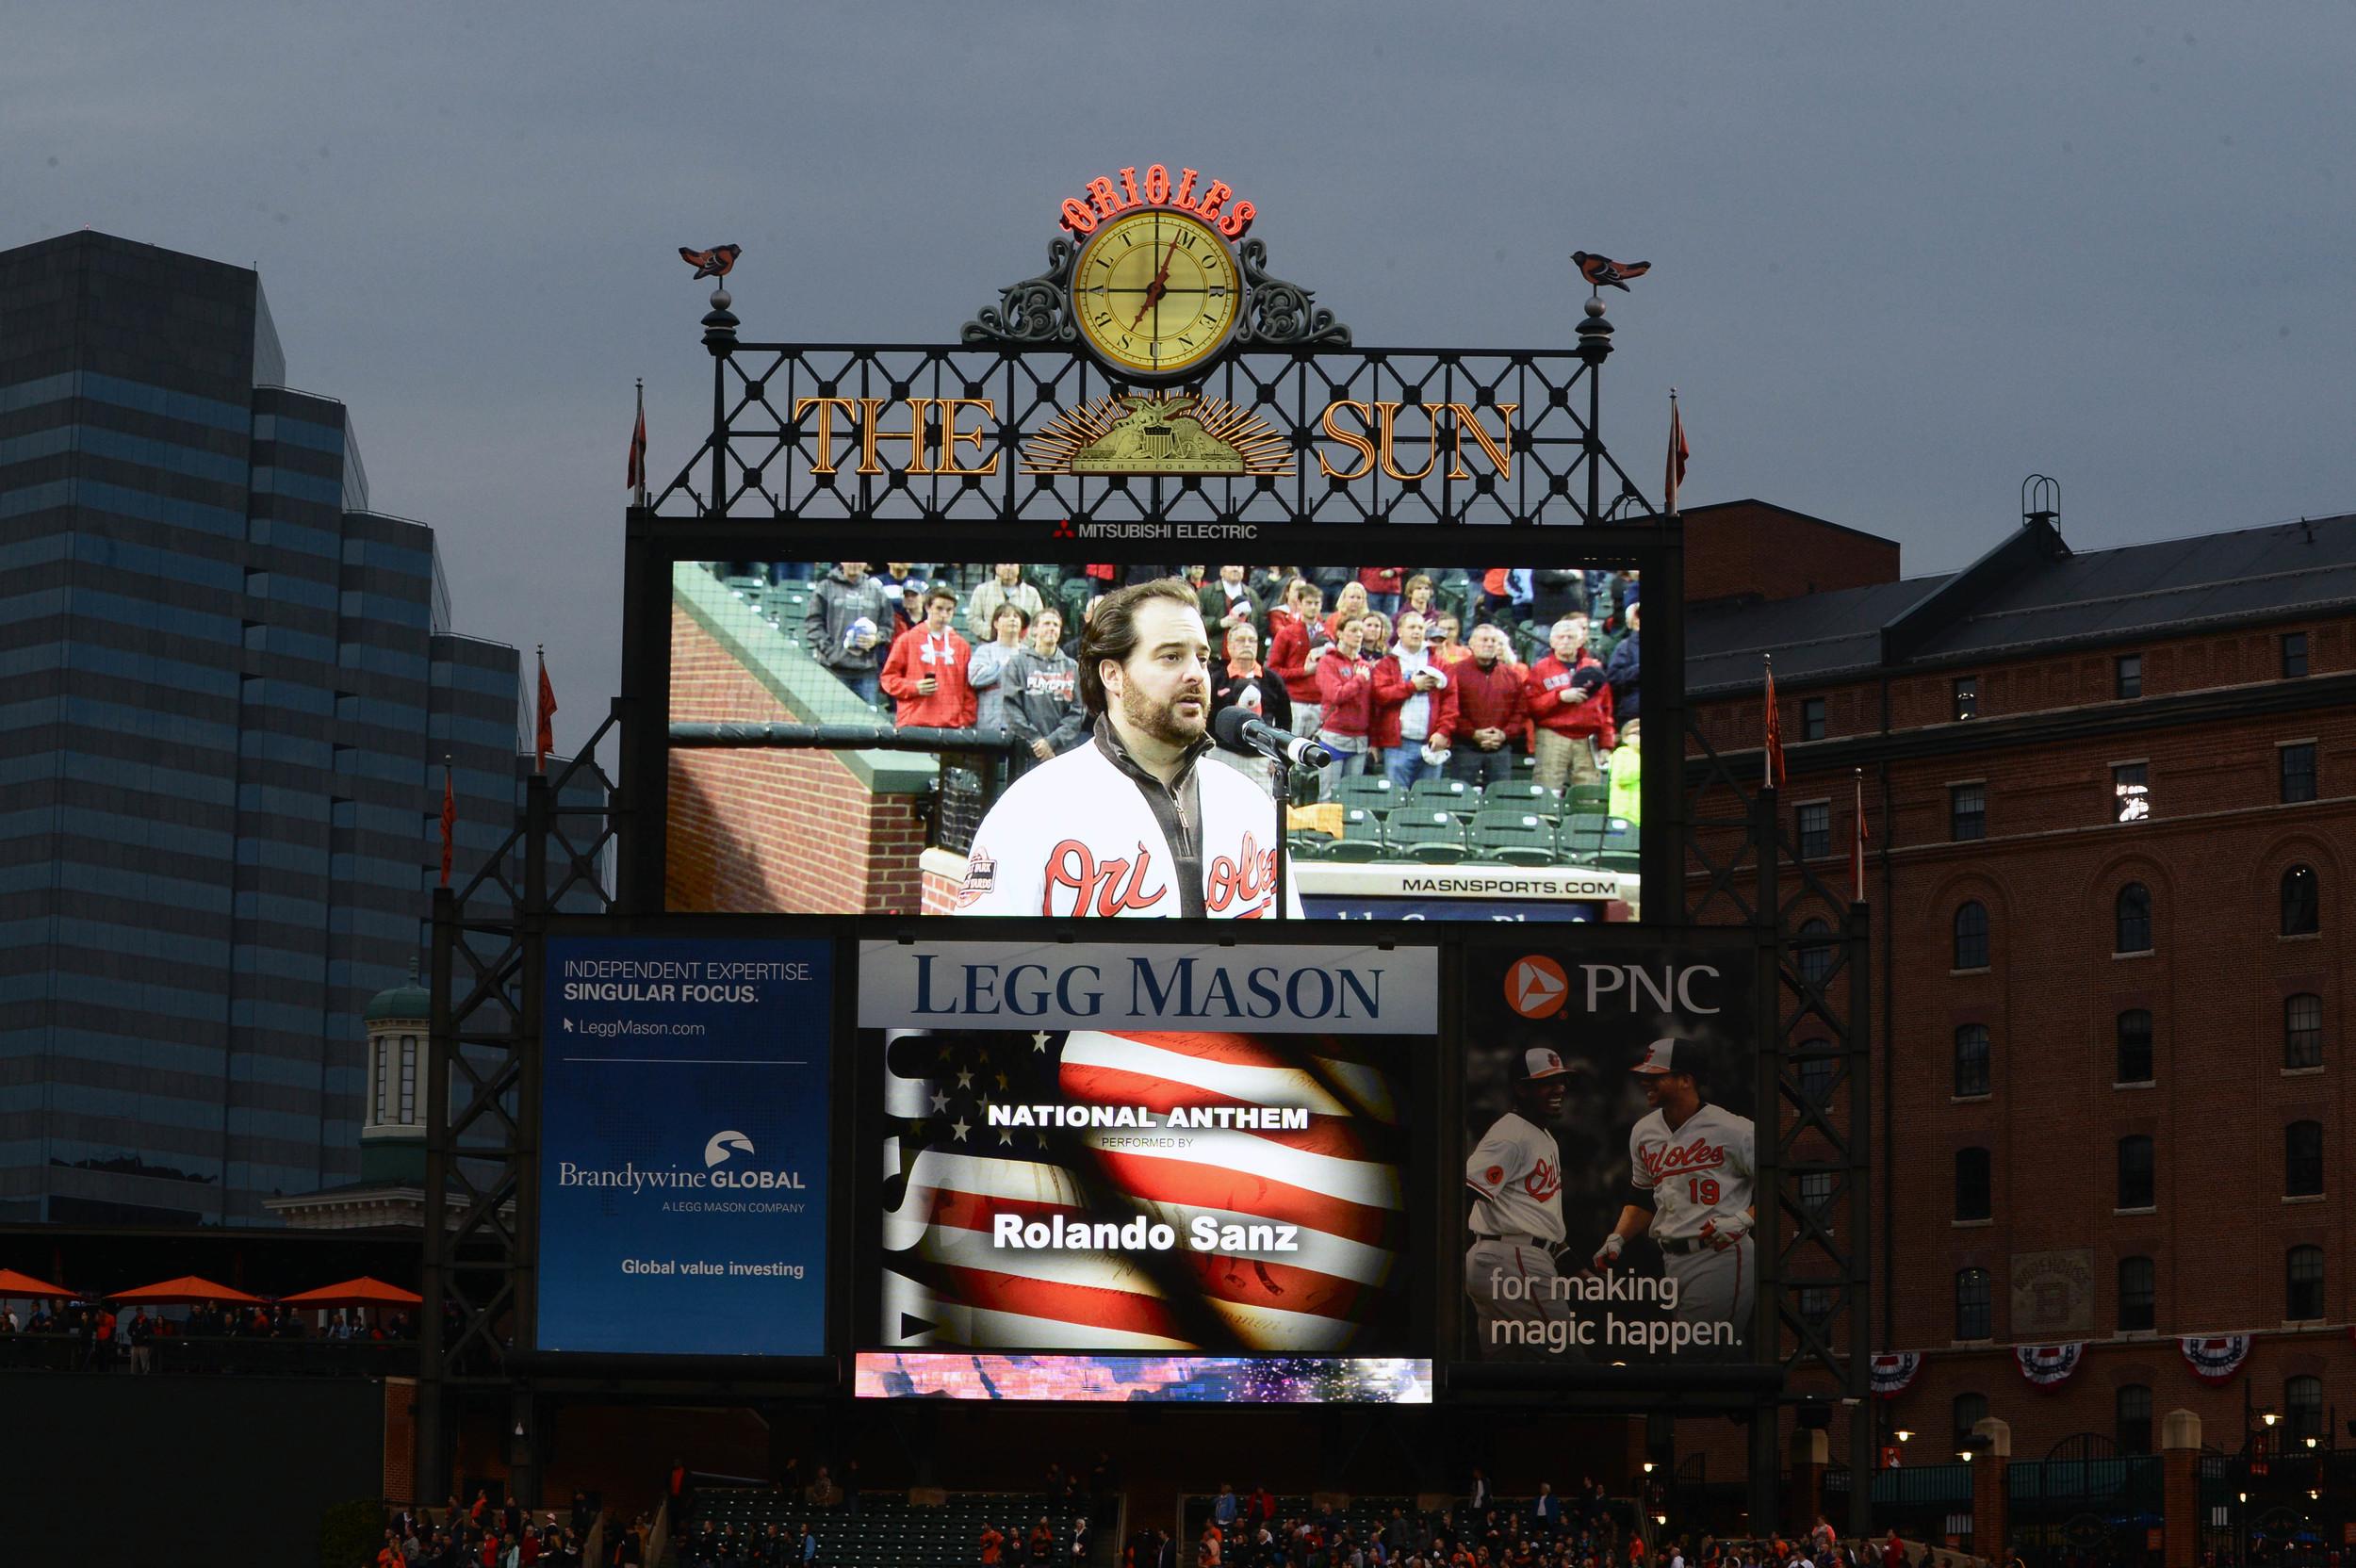 Photo courtesy of Baltimore Orioles